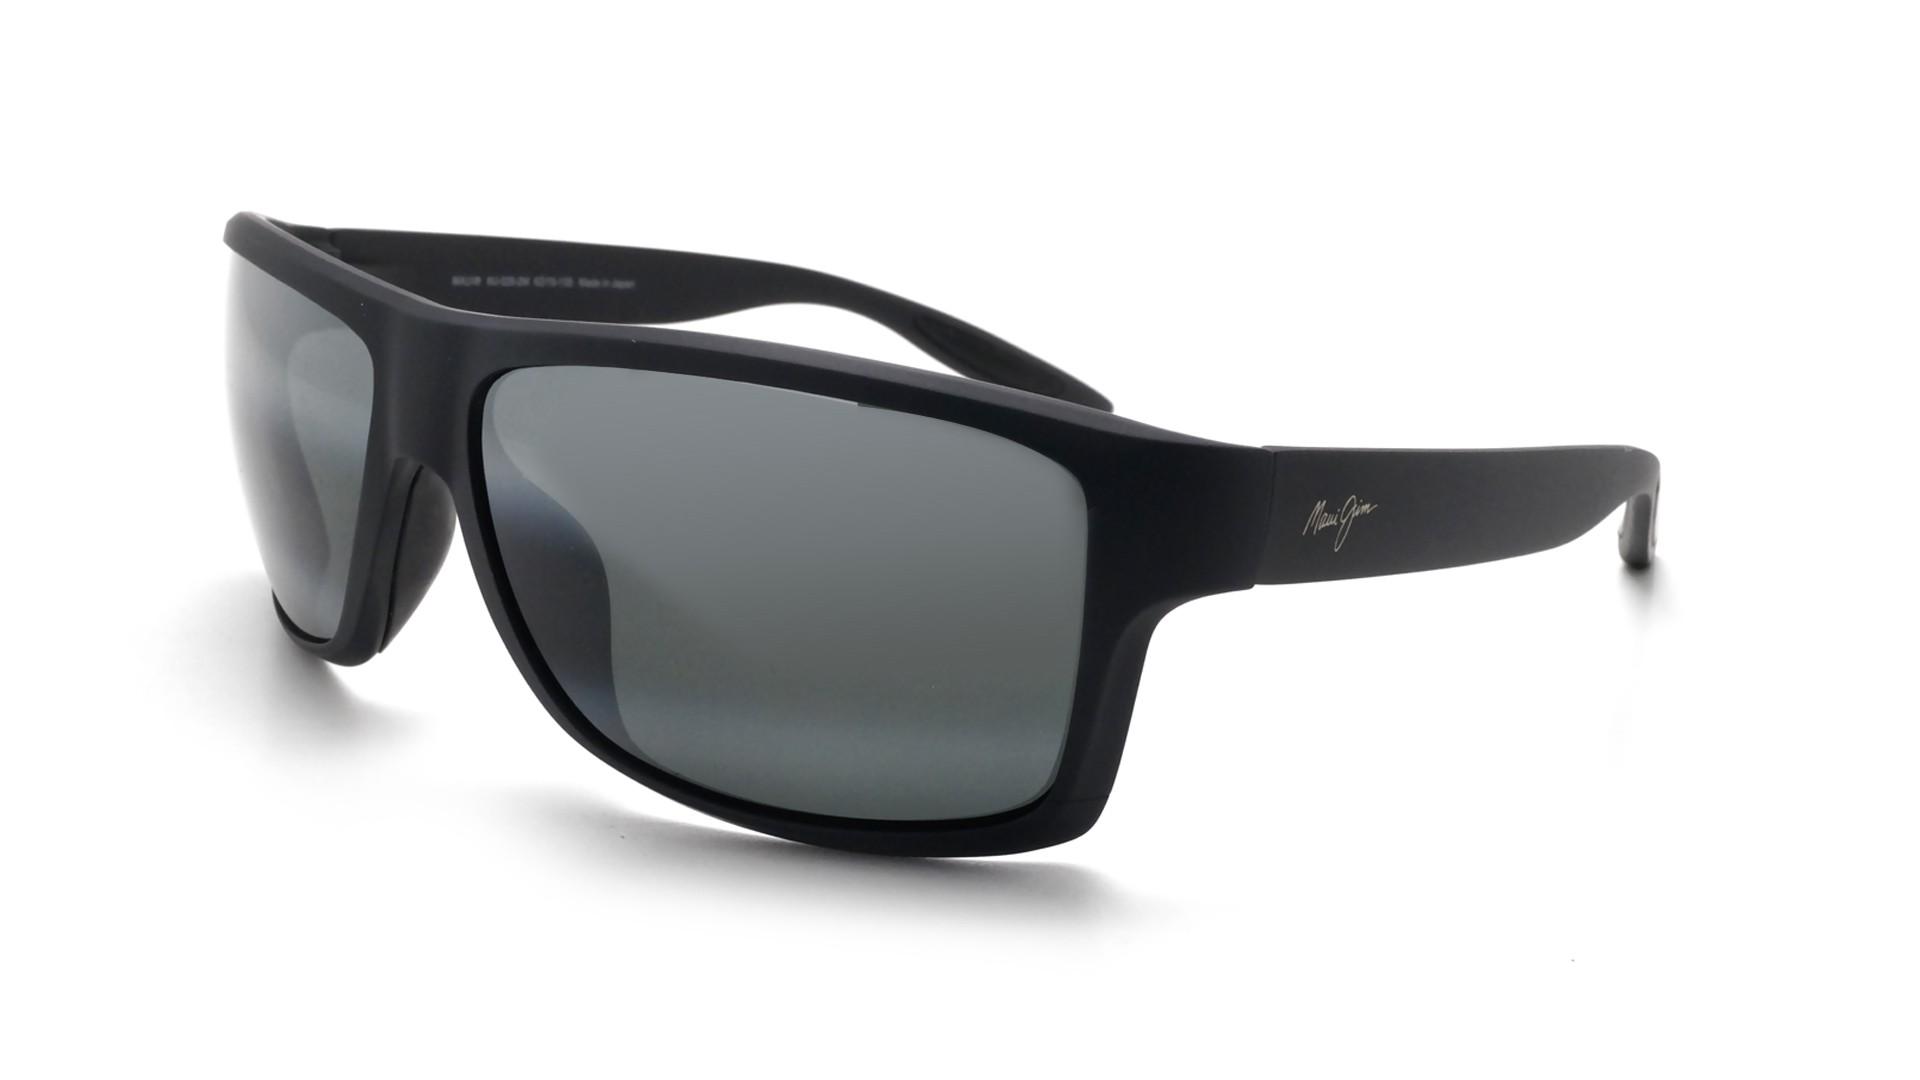 cdd1337f44d5 Sunglasses Maui Jim Pohaku Grey Matte Maui pure 528 2M 62-15 Medium  Polarized Mirror